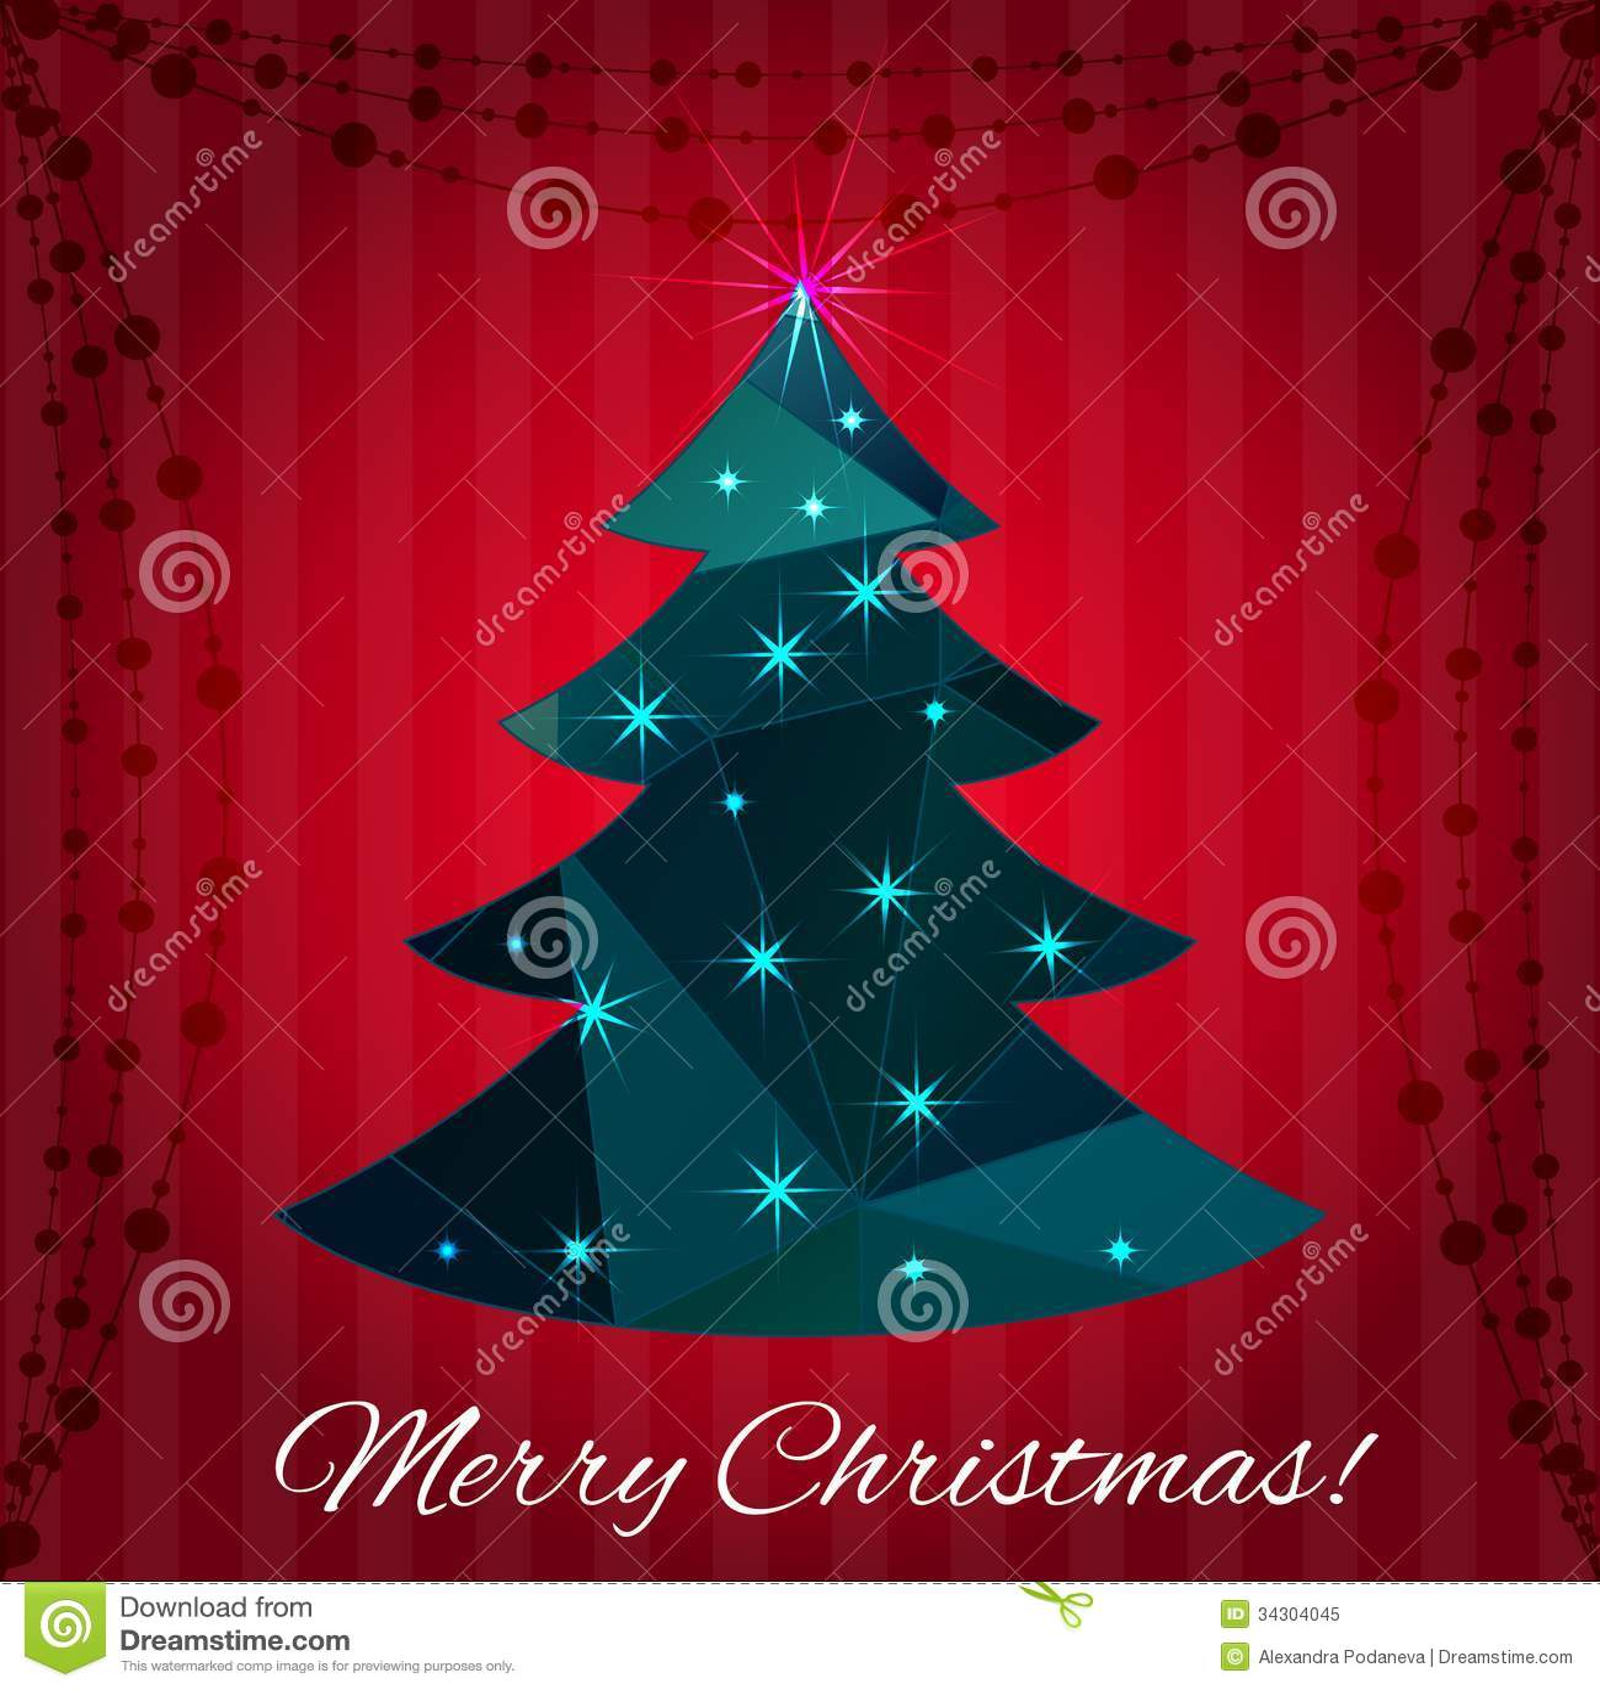 Dise o de la tarjeta de felicitaci n del rbol de navidad - Arbol de navidad diseno ...